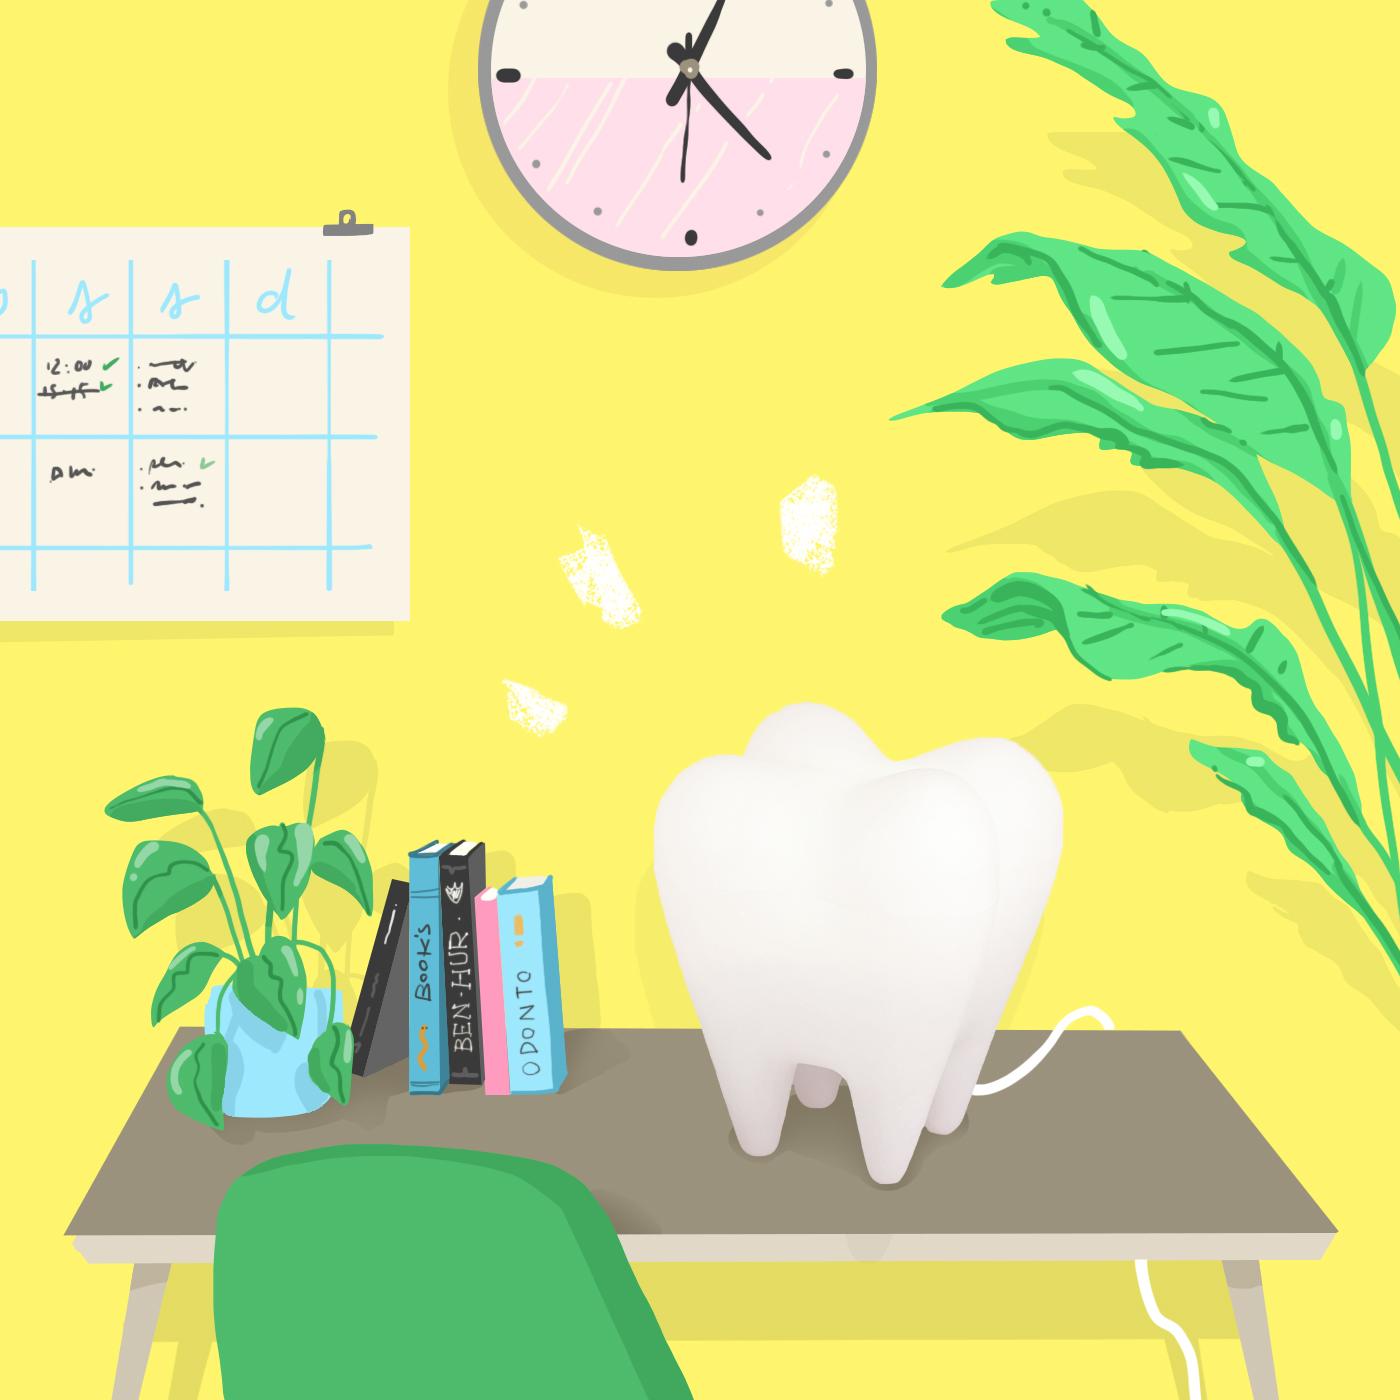 luminaria_dente_dentista_odontologia